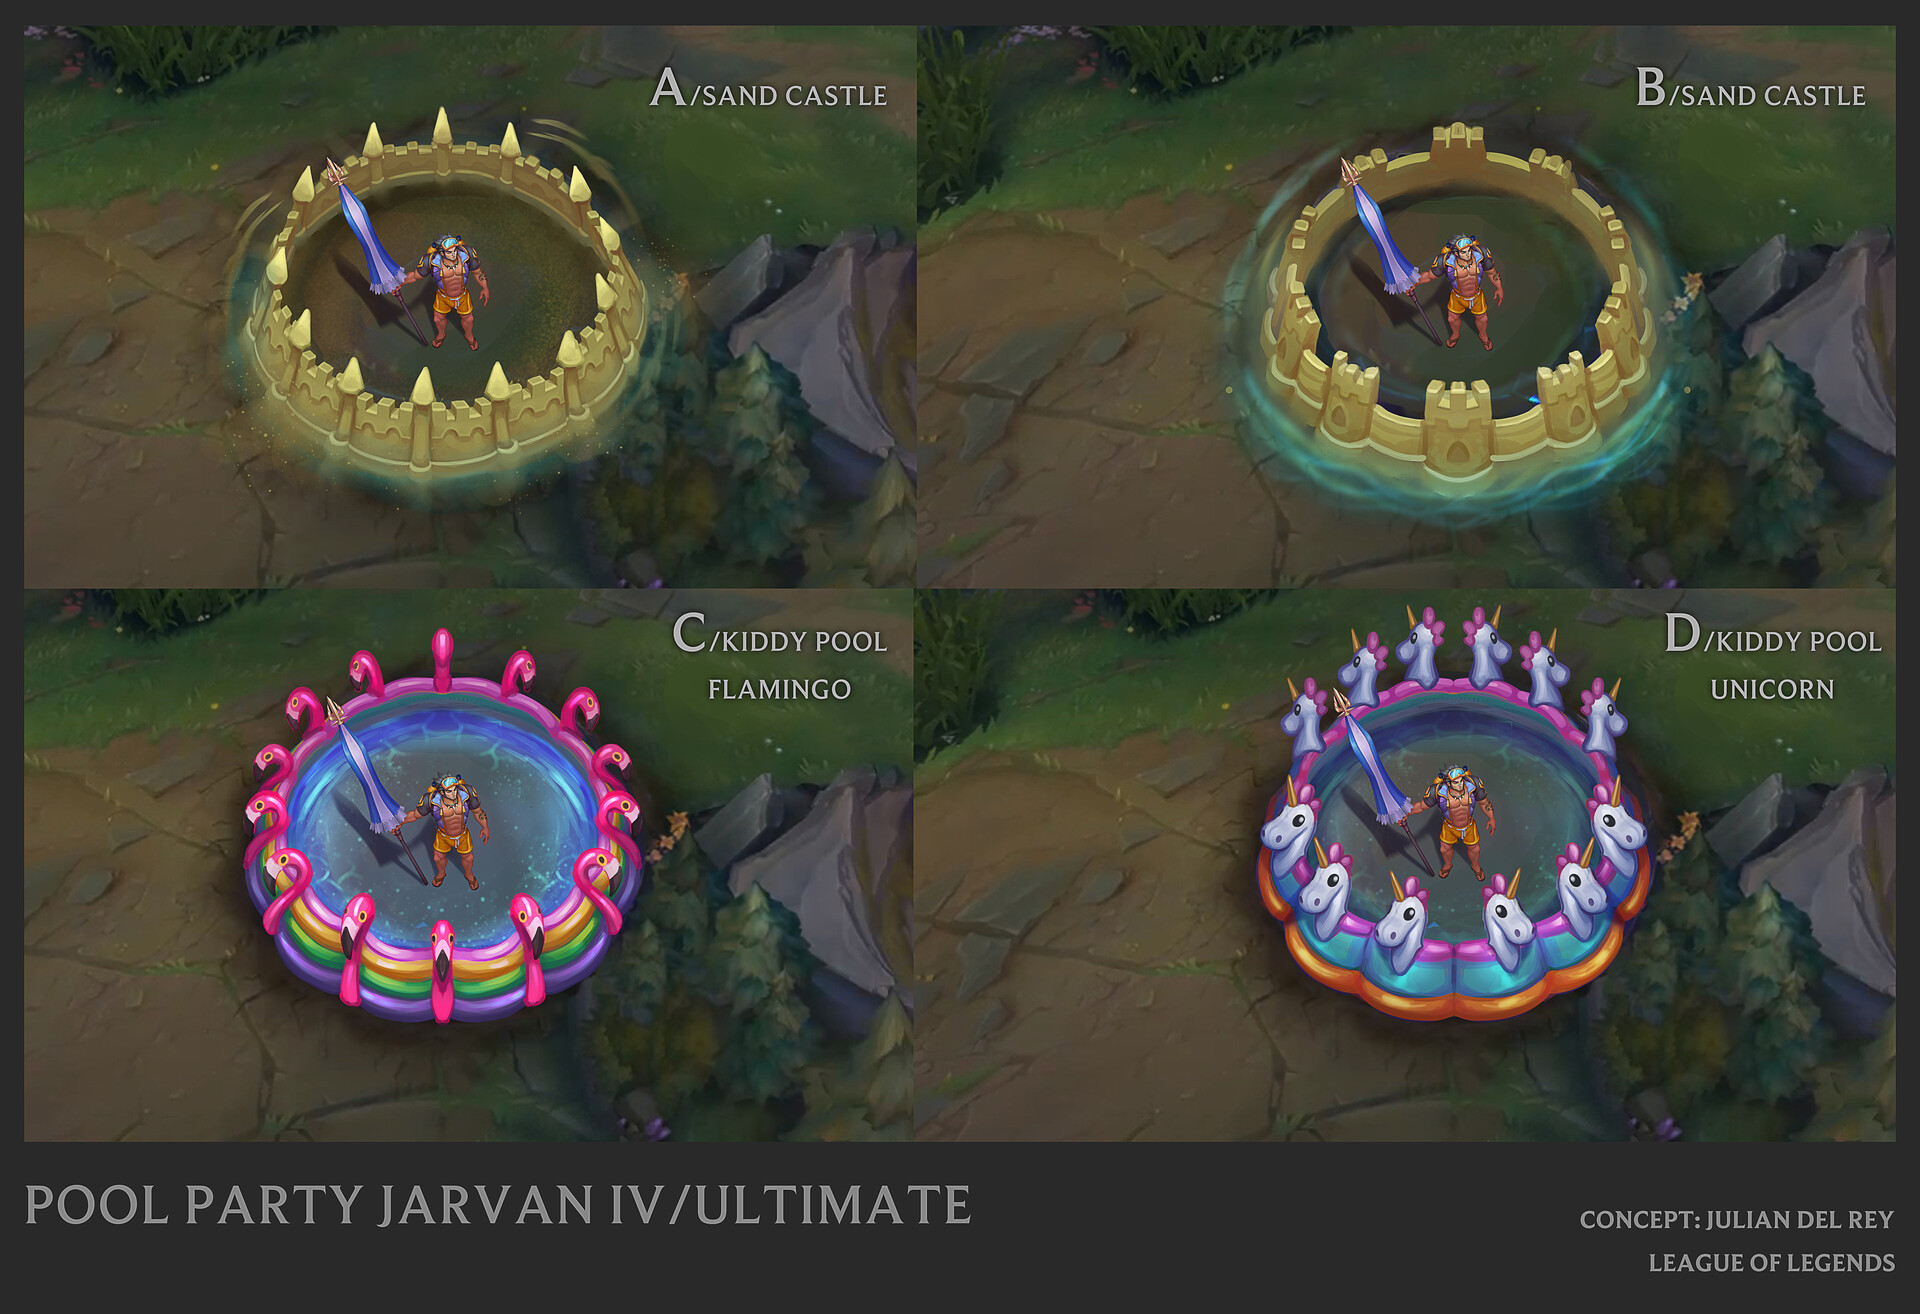 Pool Party Jarvan ultimate vfx concept proposals ©Riot Games